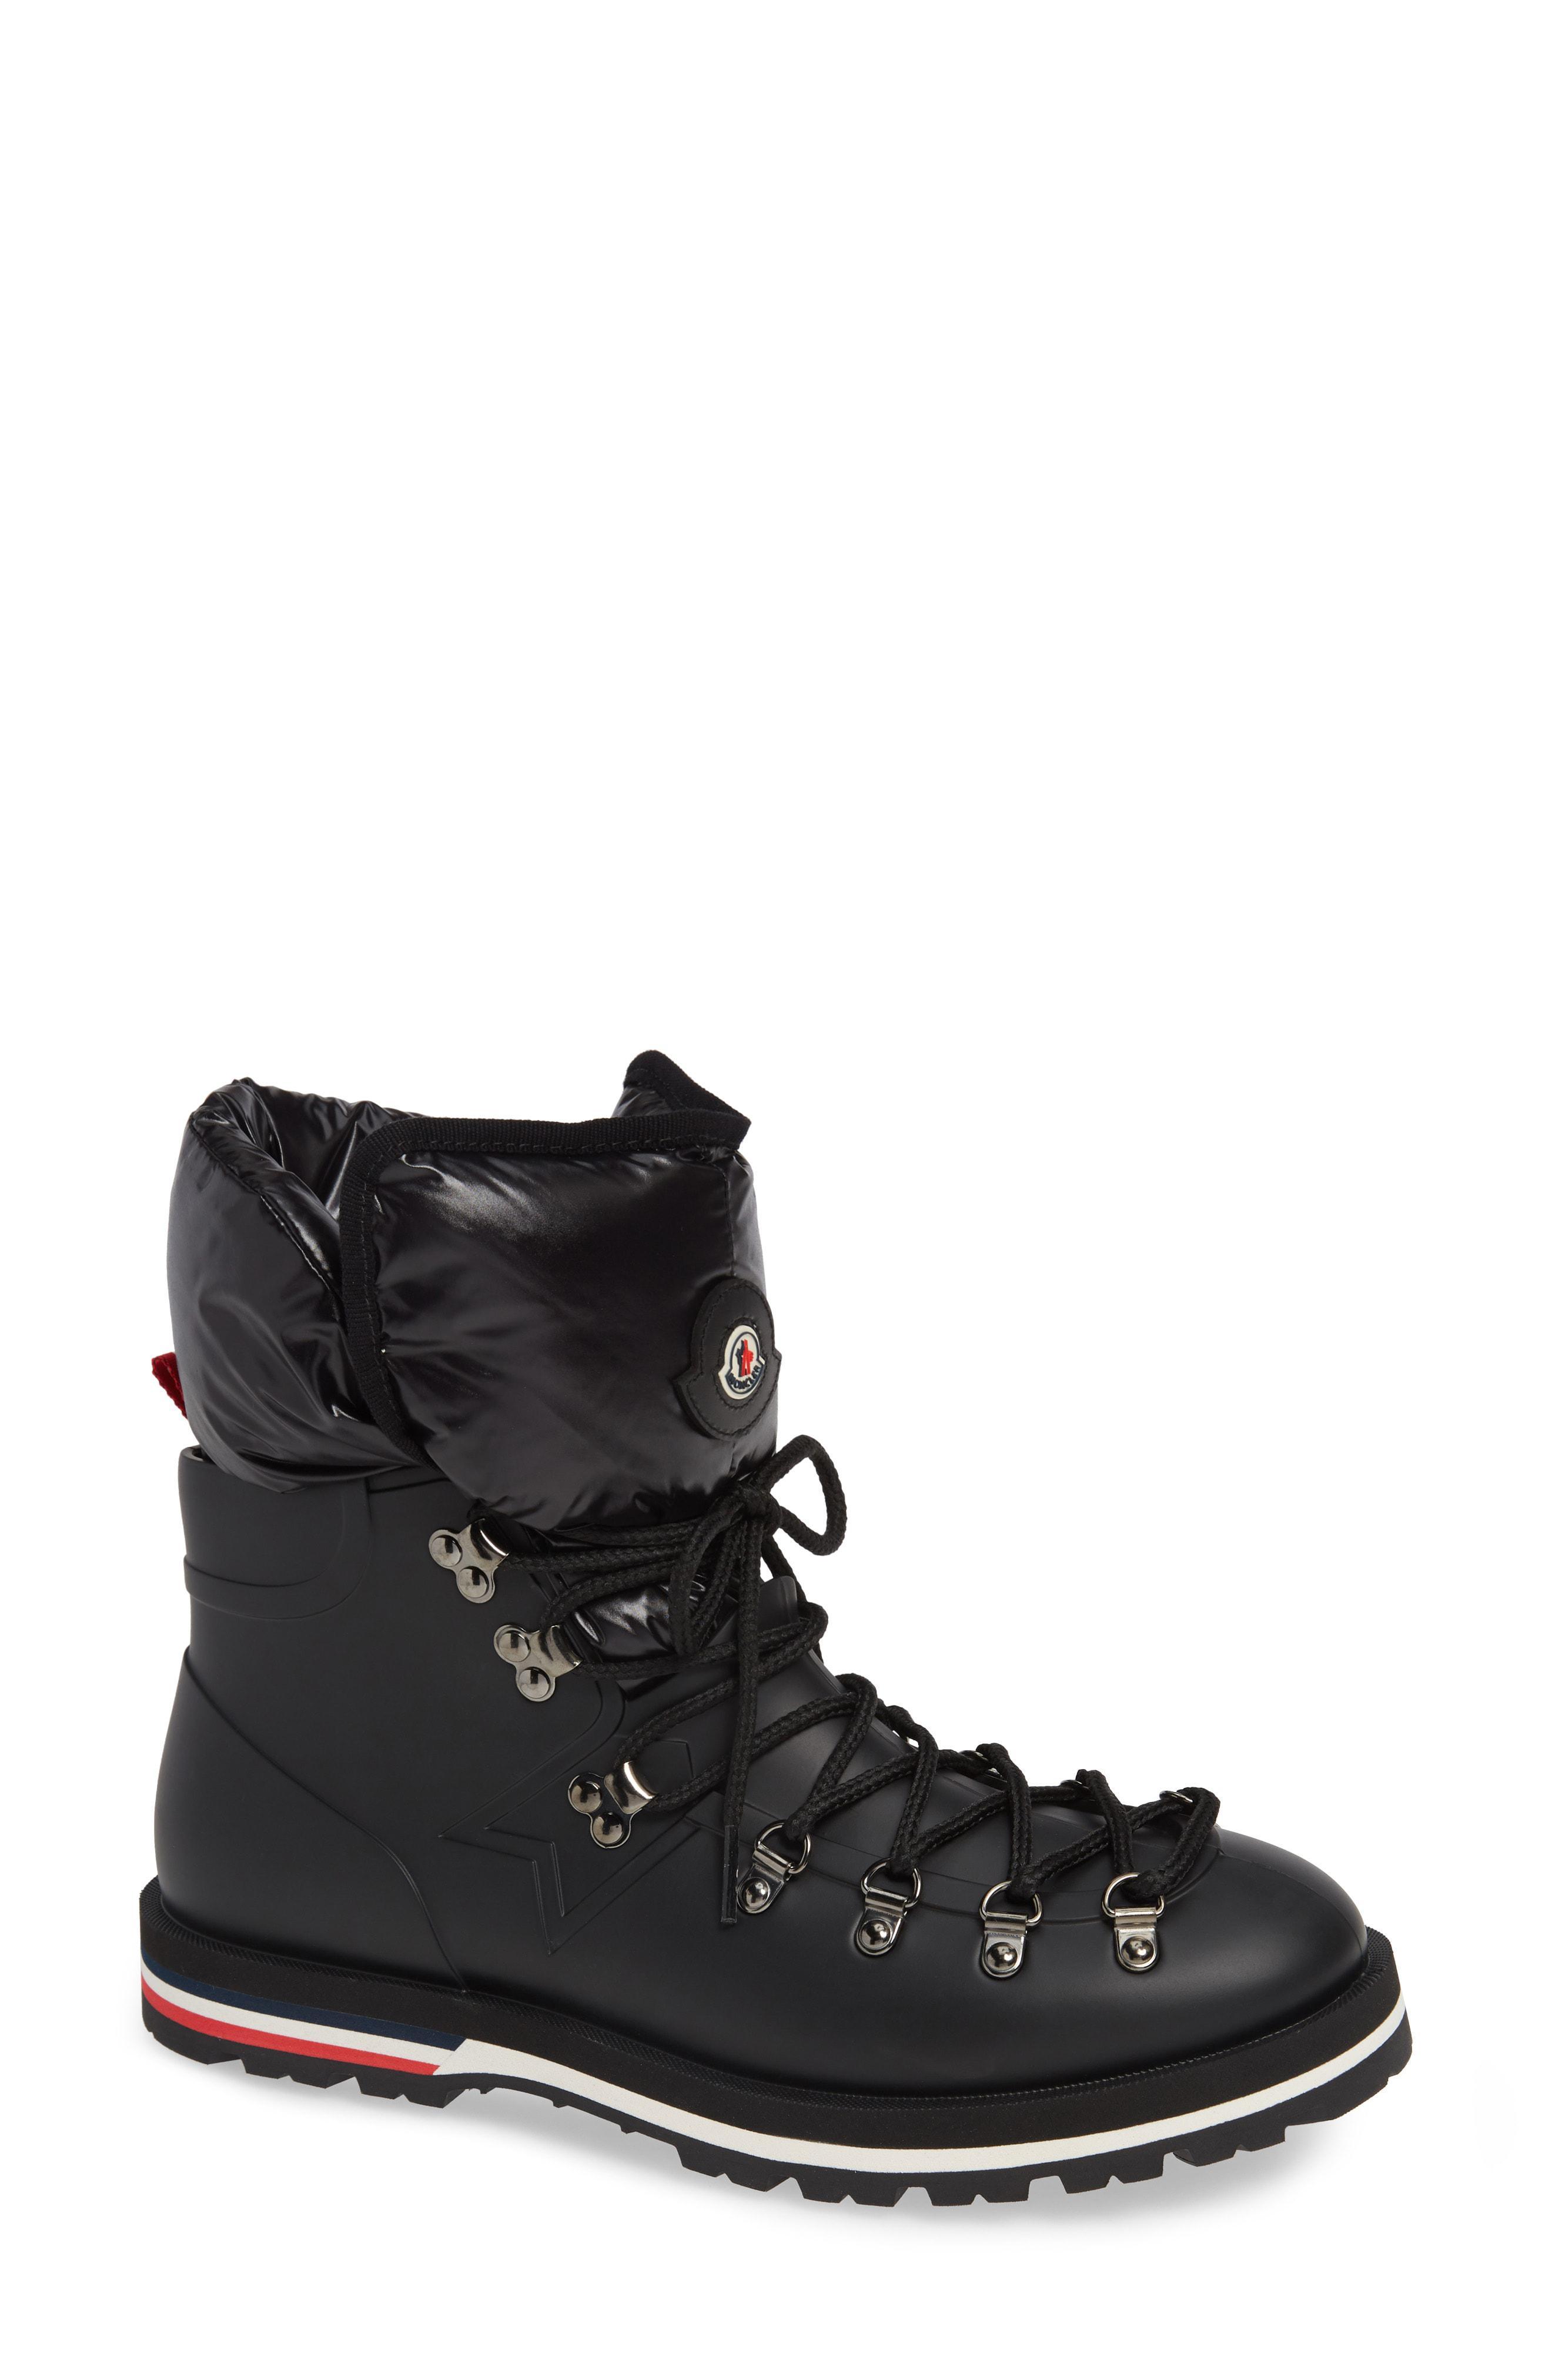 8b4bcddb5 Lyst - Moncler Inaya Boot in Black